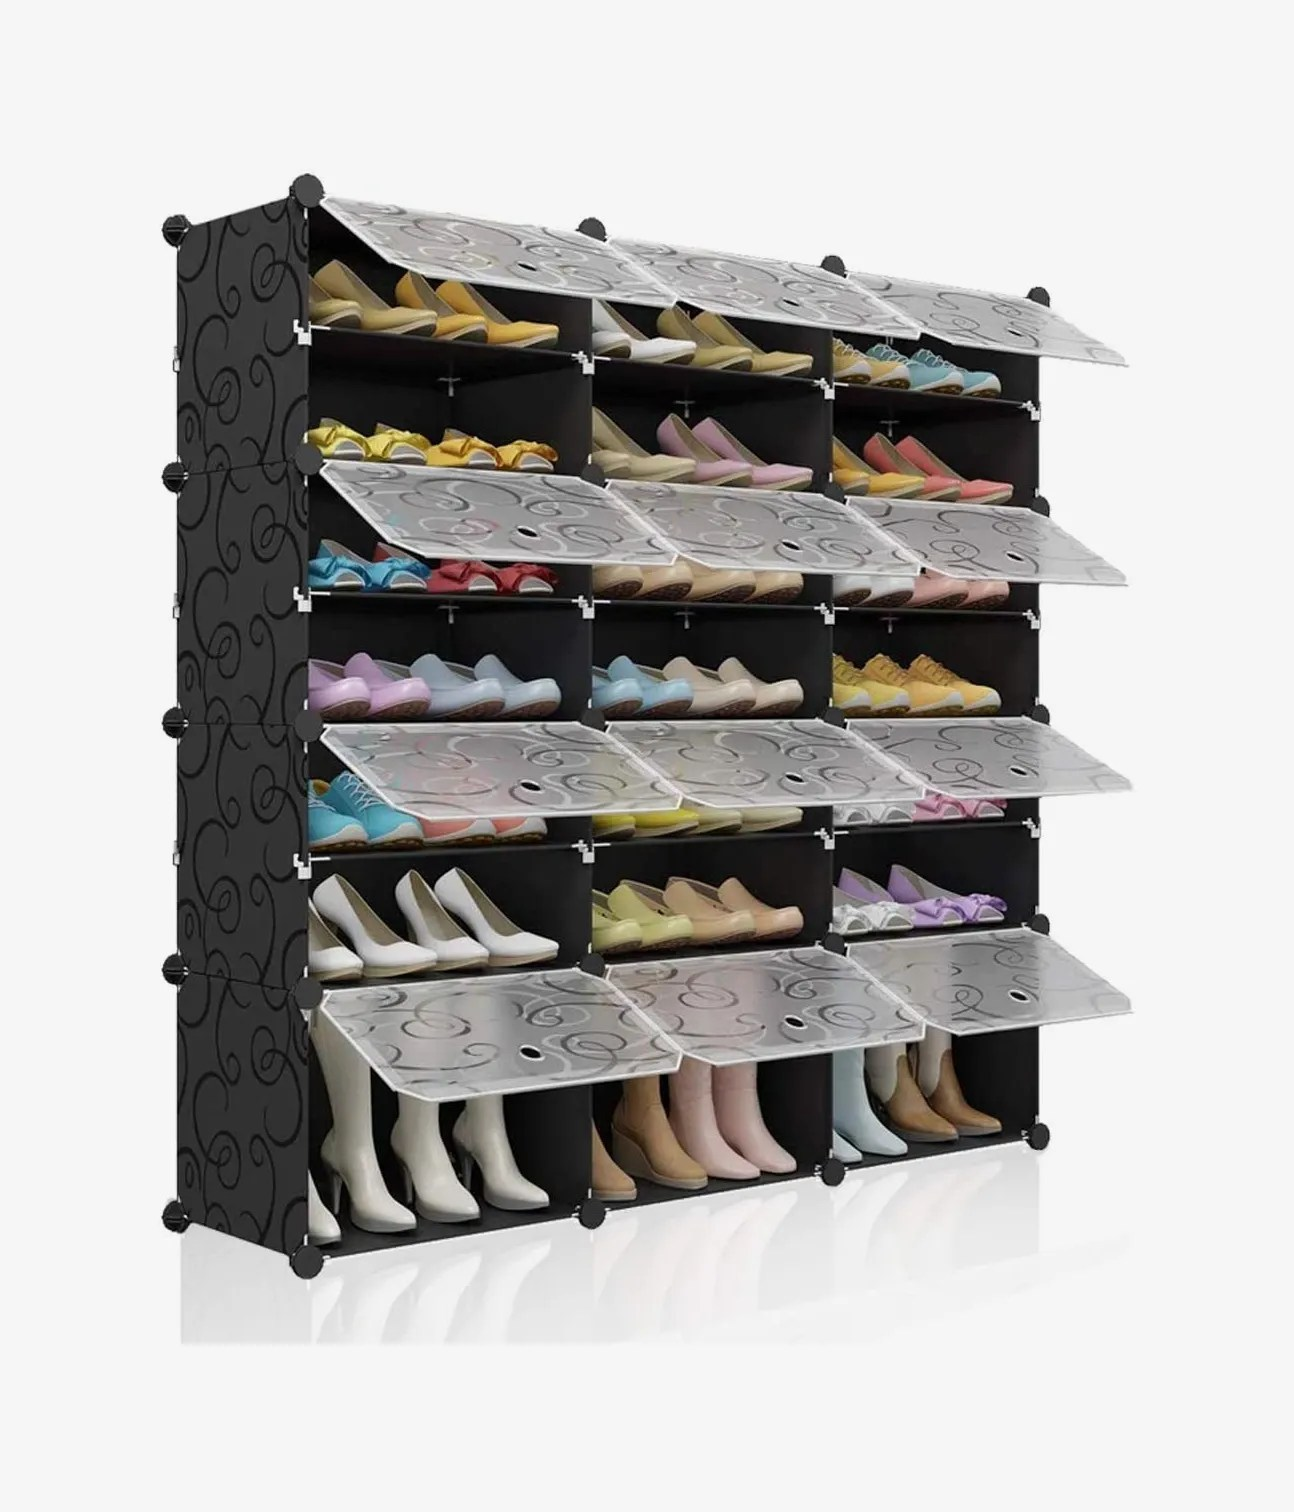 kousi portable shoe rack organizer 48 pairs